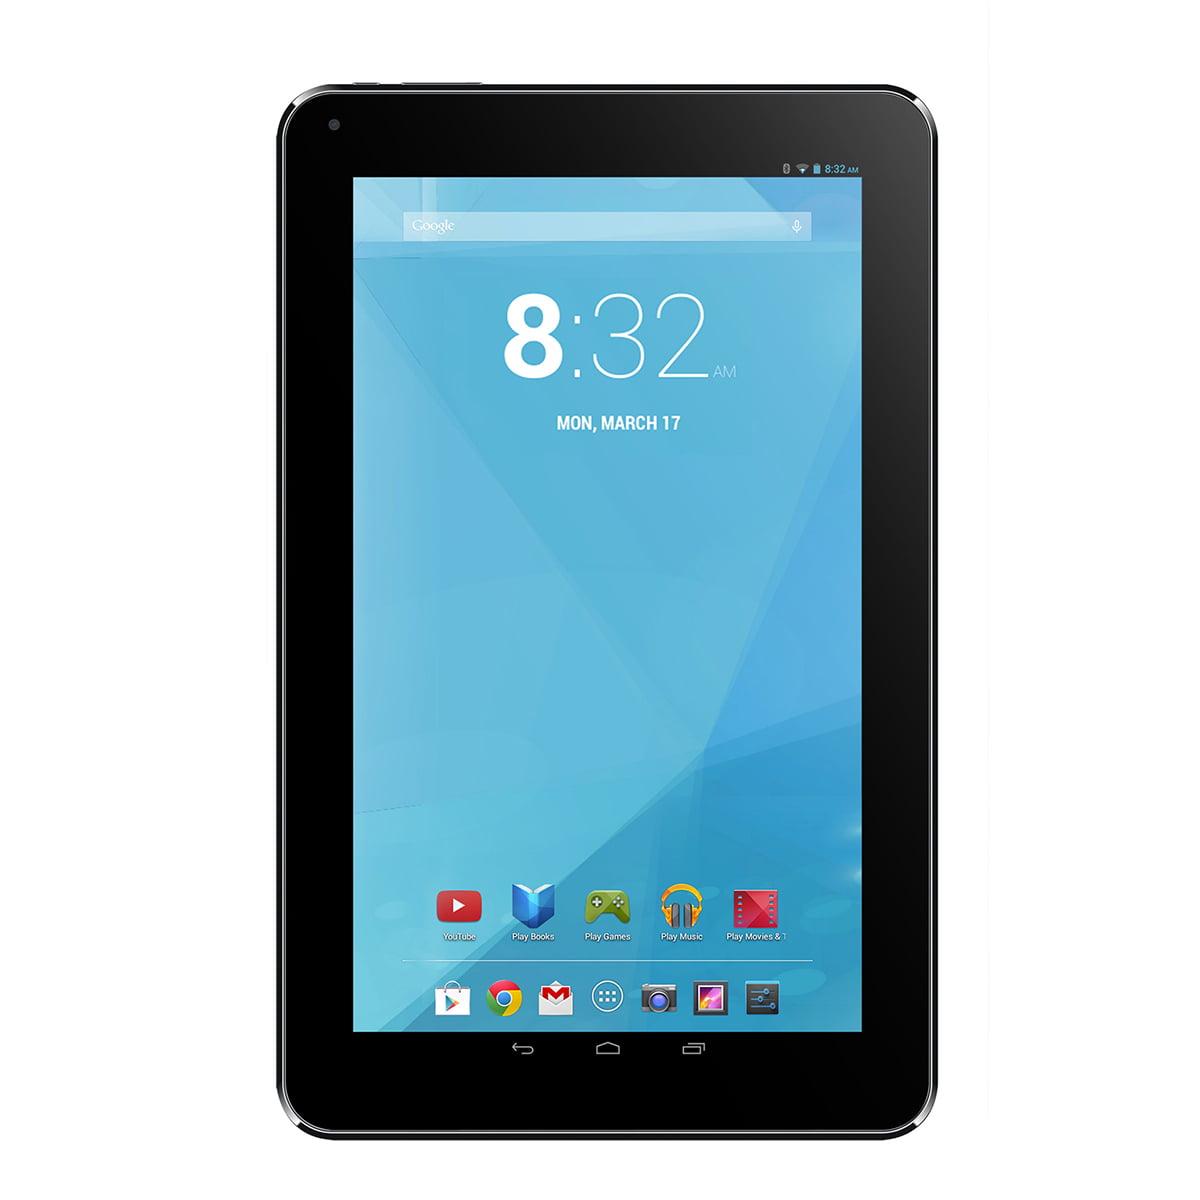 Trio Stealth G4 7 Quad Core 1 5ghz Touchscreen Tablet Android 4 4 With Webcam Walmart Com Walmart Com